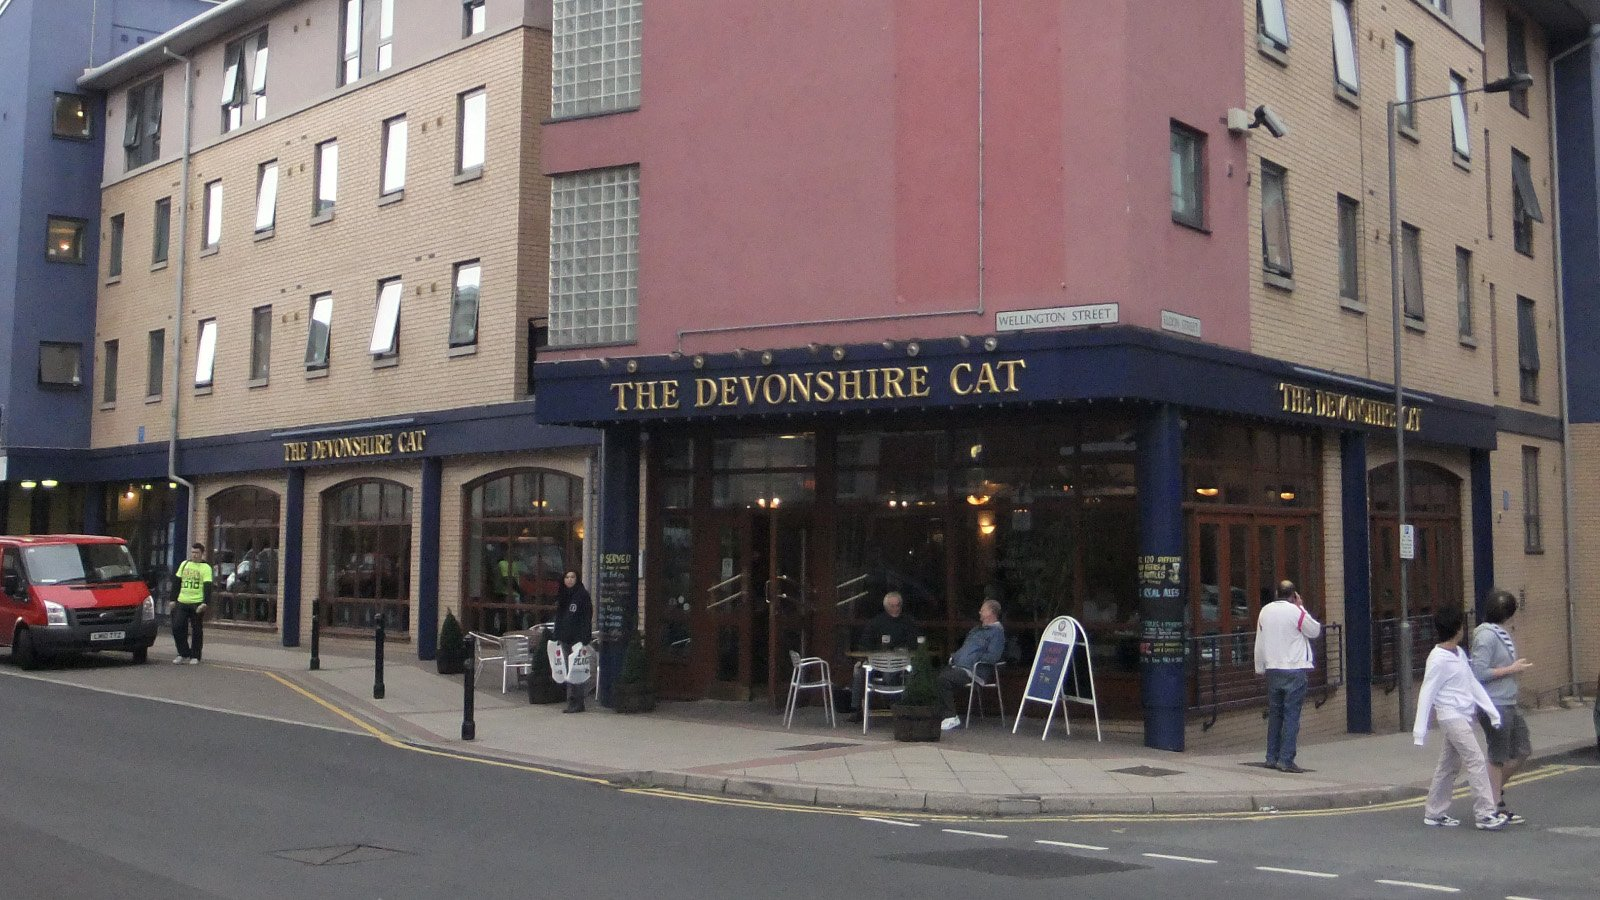 The Devonshire Cat pub, Sheffield